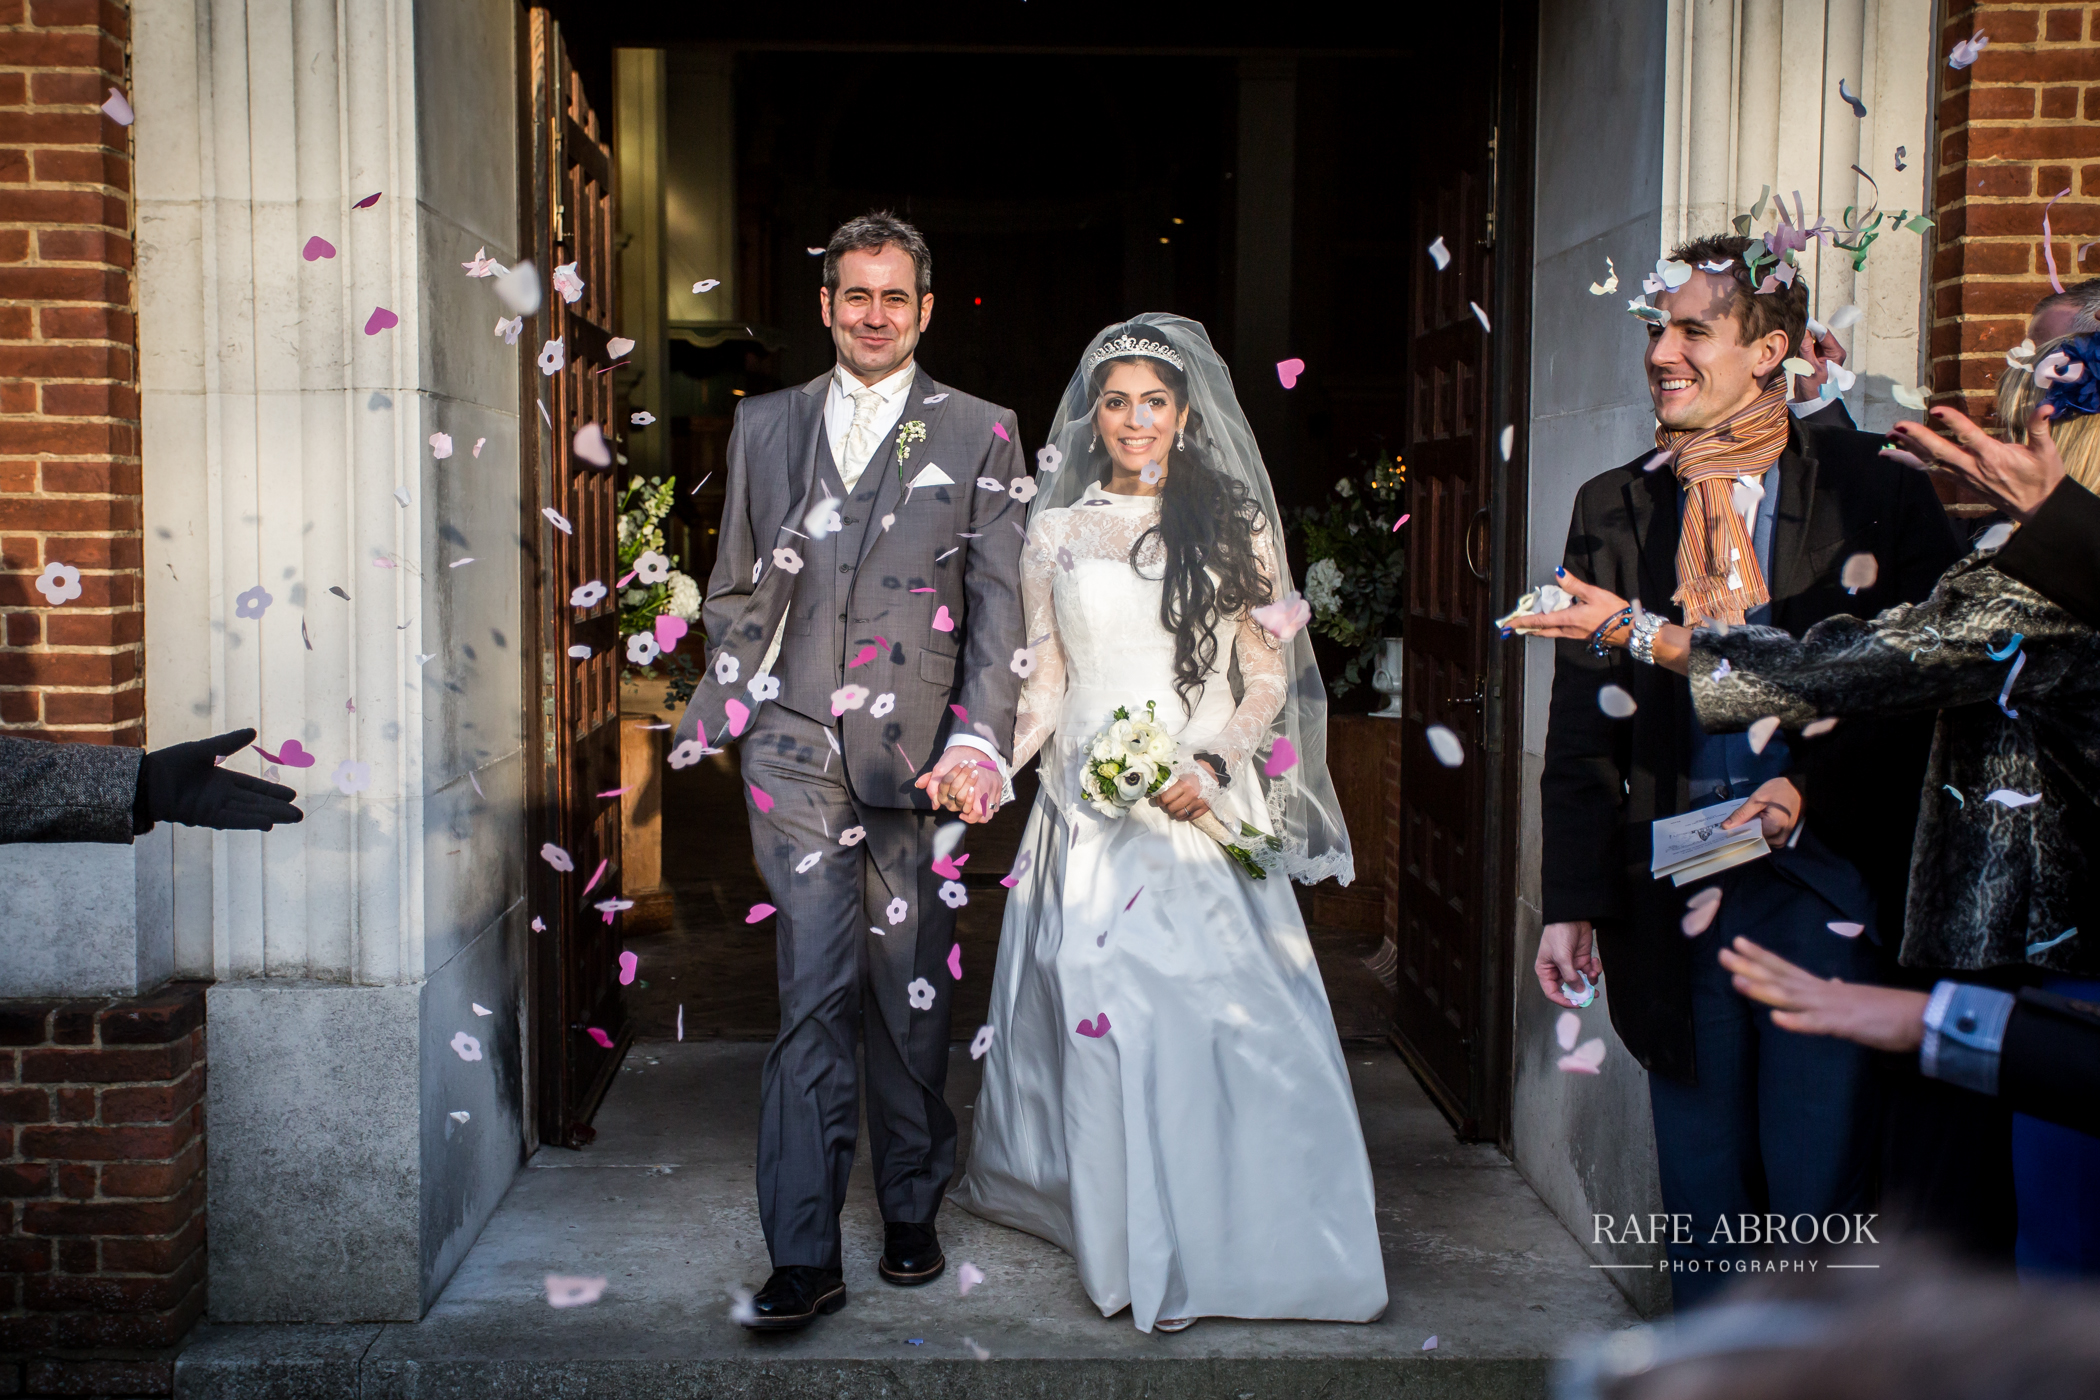 roma & pete wedding hampstead shenley hertfordshire -254.jpg